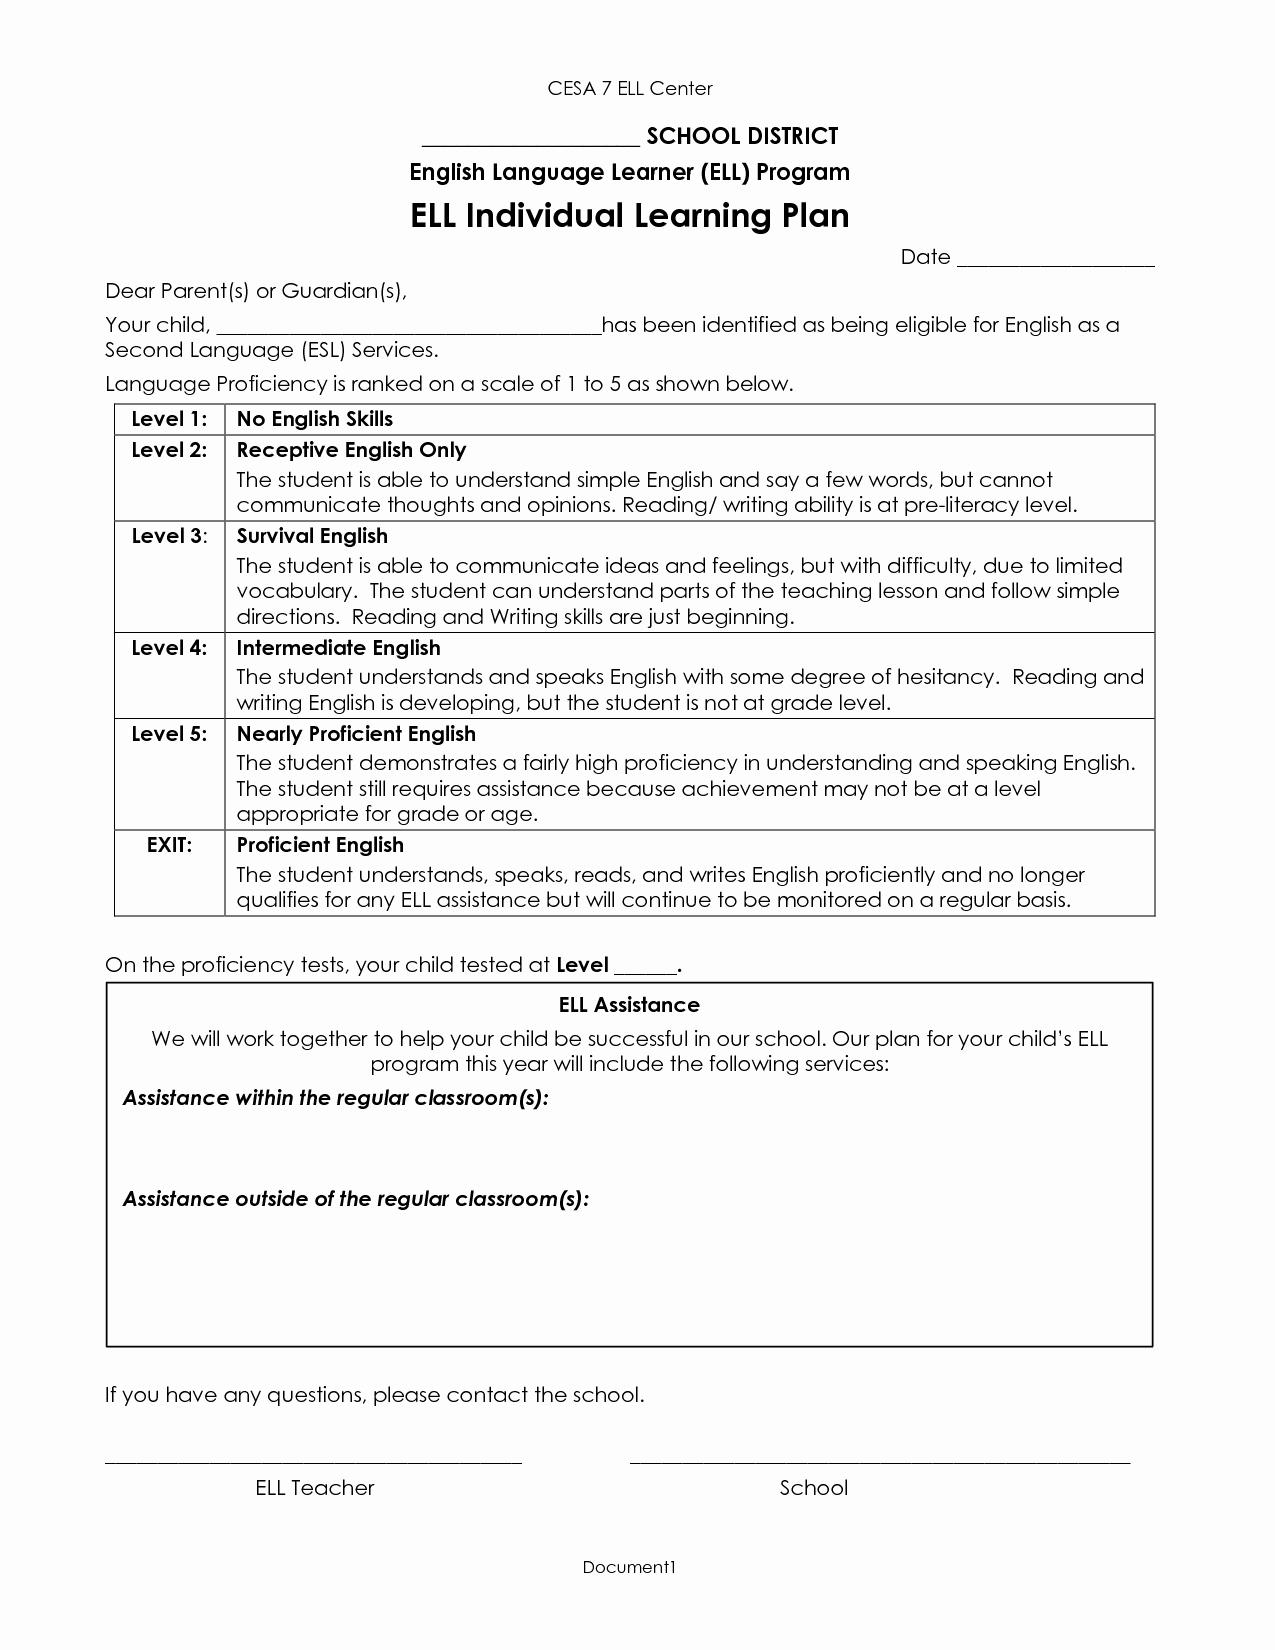 Individual Learning Plan Template Inspirational Best S Of Individual Program Plan Sample Individual